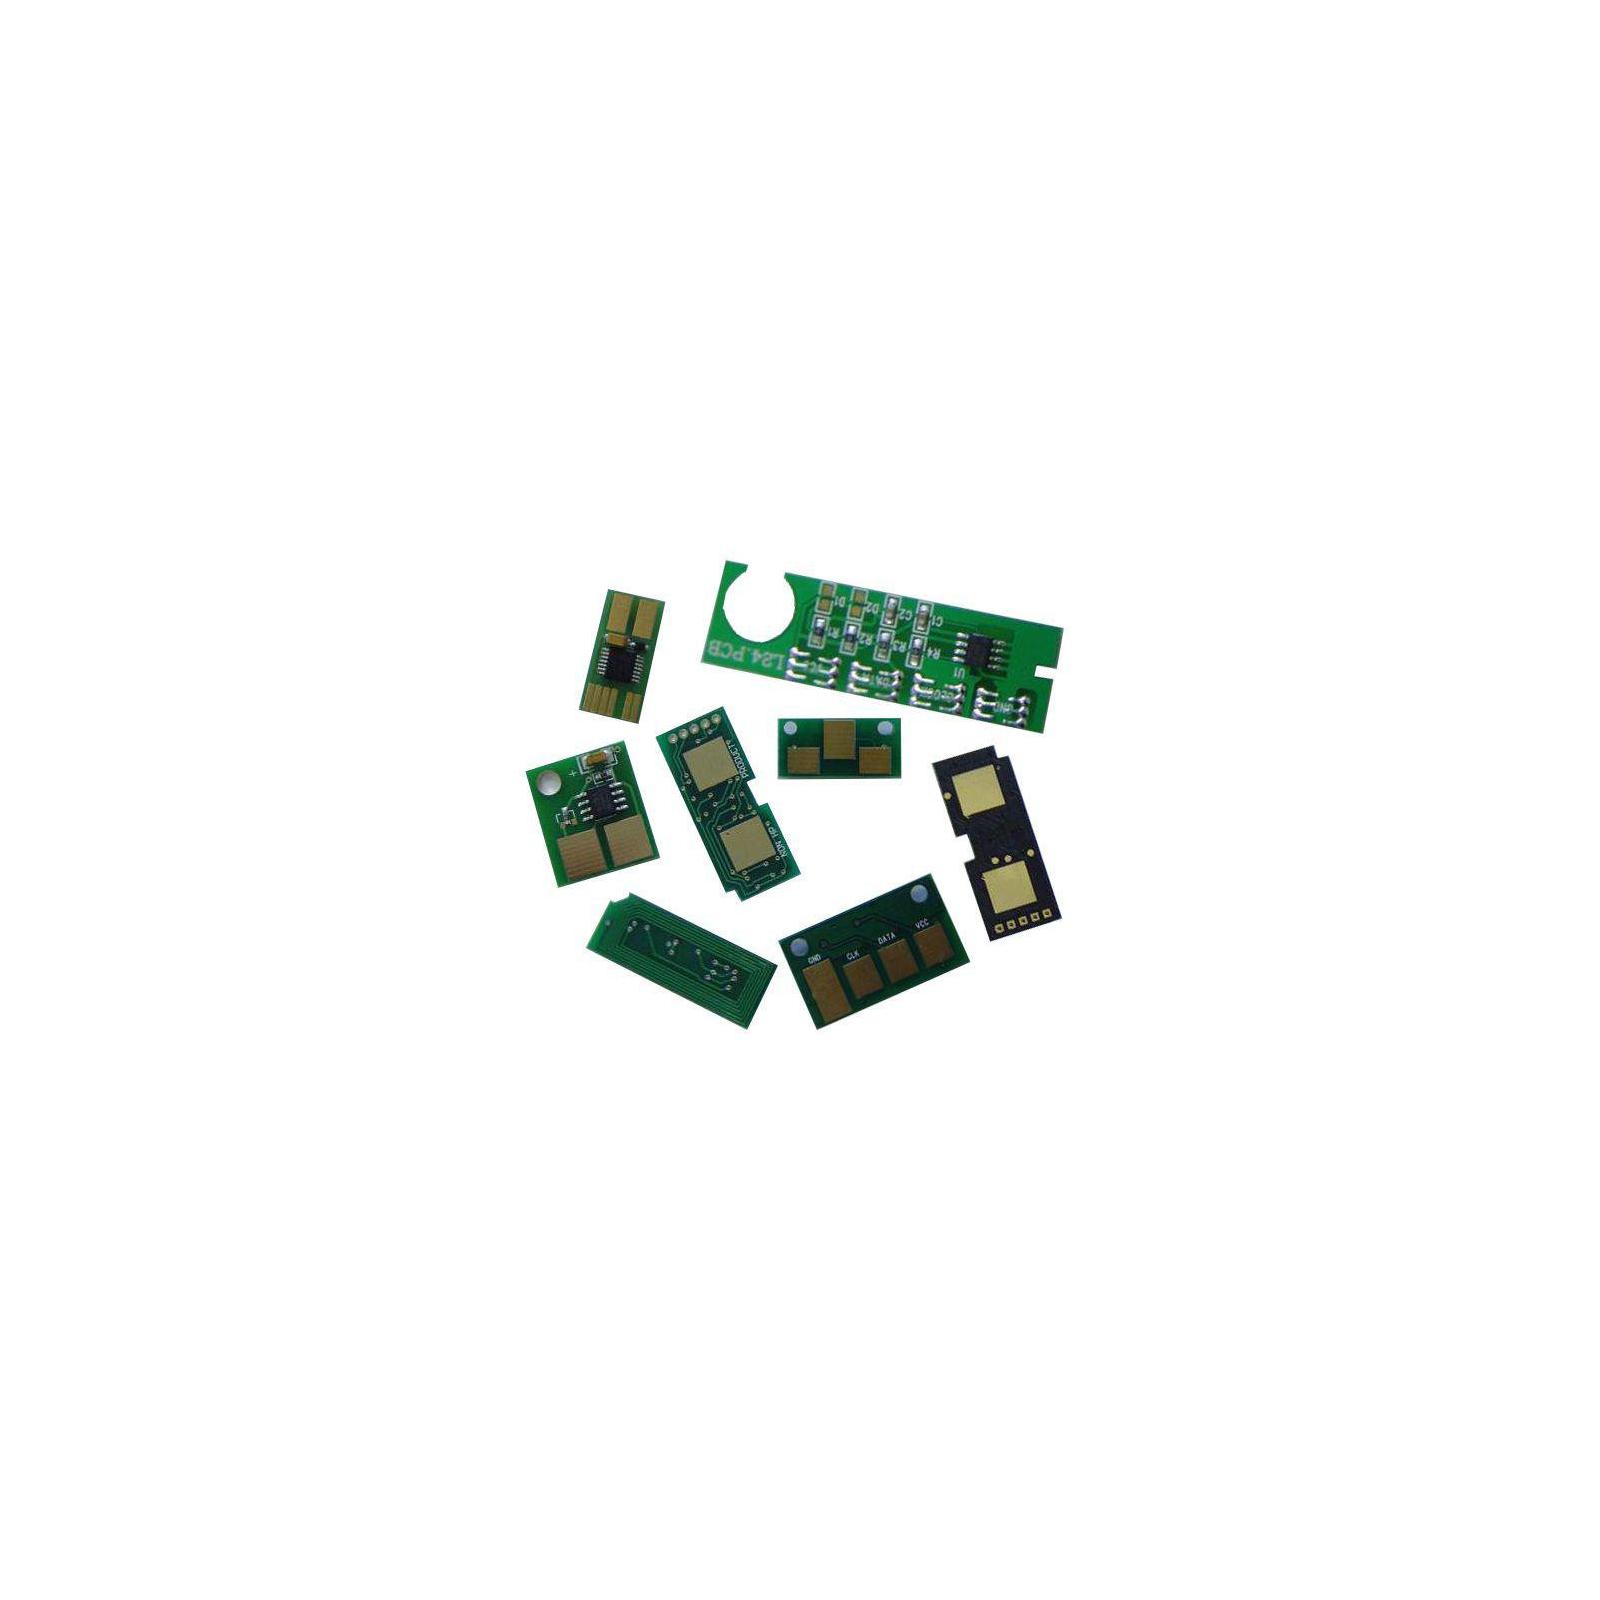 Чип для картриджа SHARP MX-312/MX261/311 16K Everprint (CHIP-SHA-MX312)